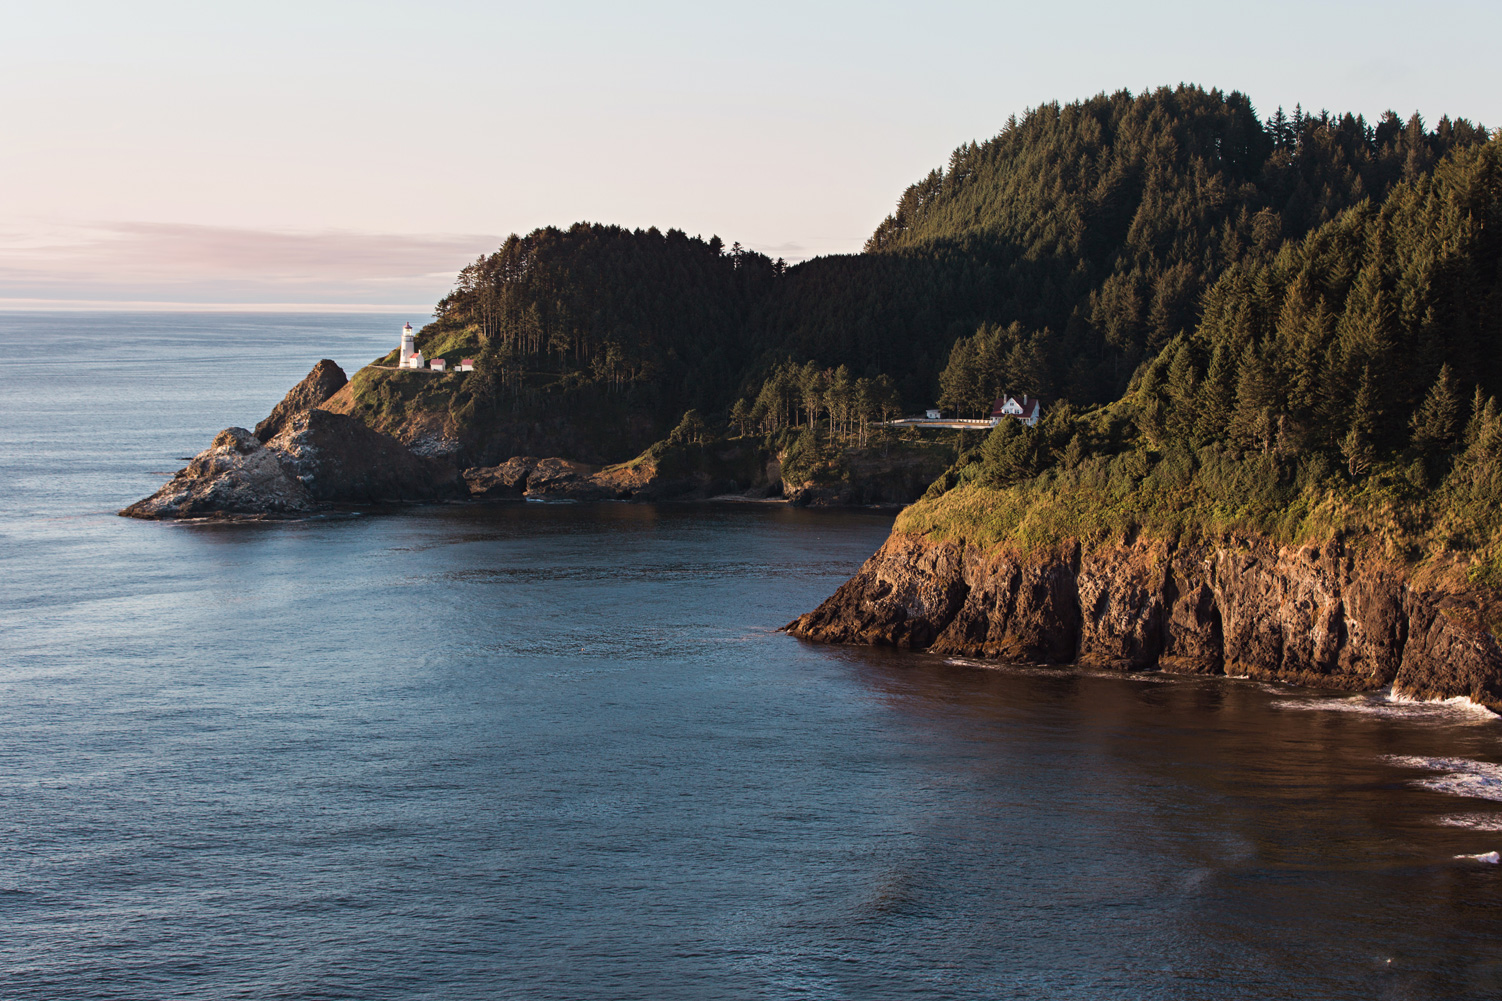 CindyGiovagnoli_Crater_Lake_National_Park_Cape_Perpetua_Heceta_Head_lighthouse_Pacific_Ocean_Cannon_Beach_haystack_Oregon_coast-018.jpg